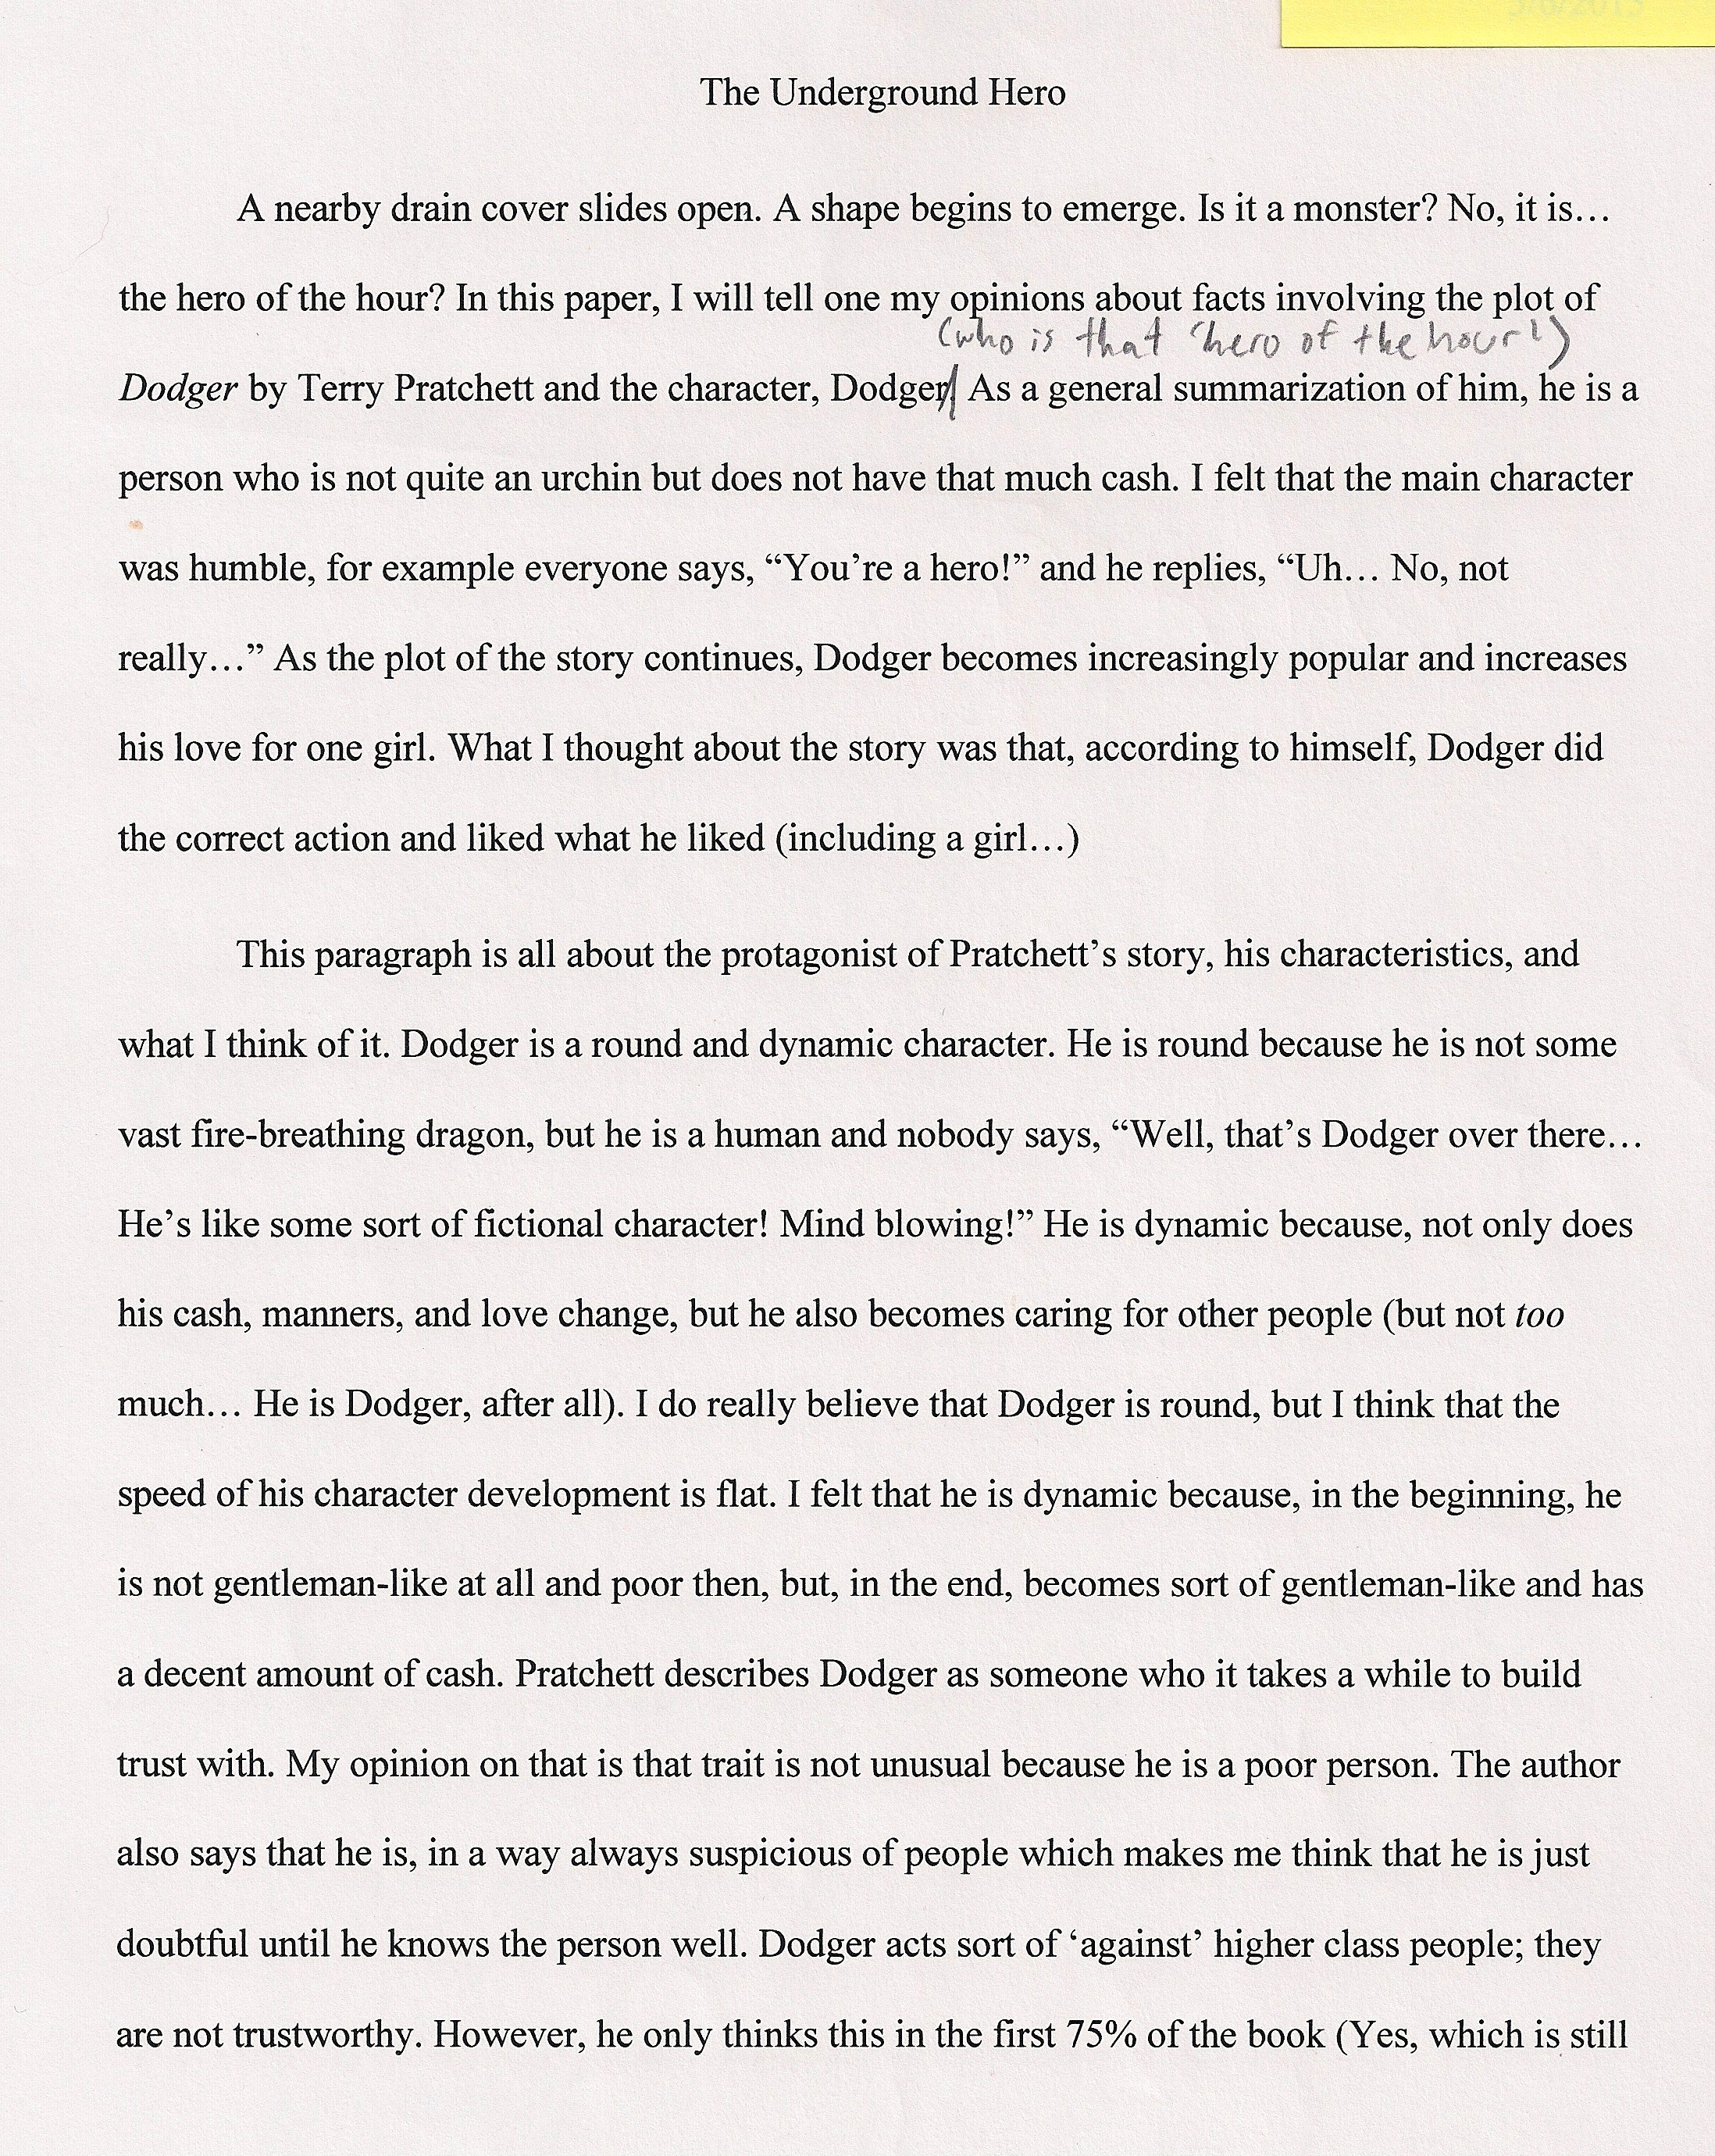 001 Heros Essay Example The Underground Hero Beautiful Hero's Journey Titles Heroes Robert Cormier Questions Outline Full